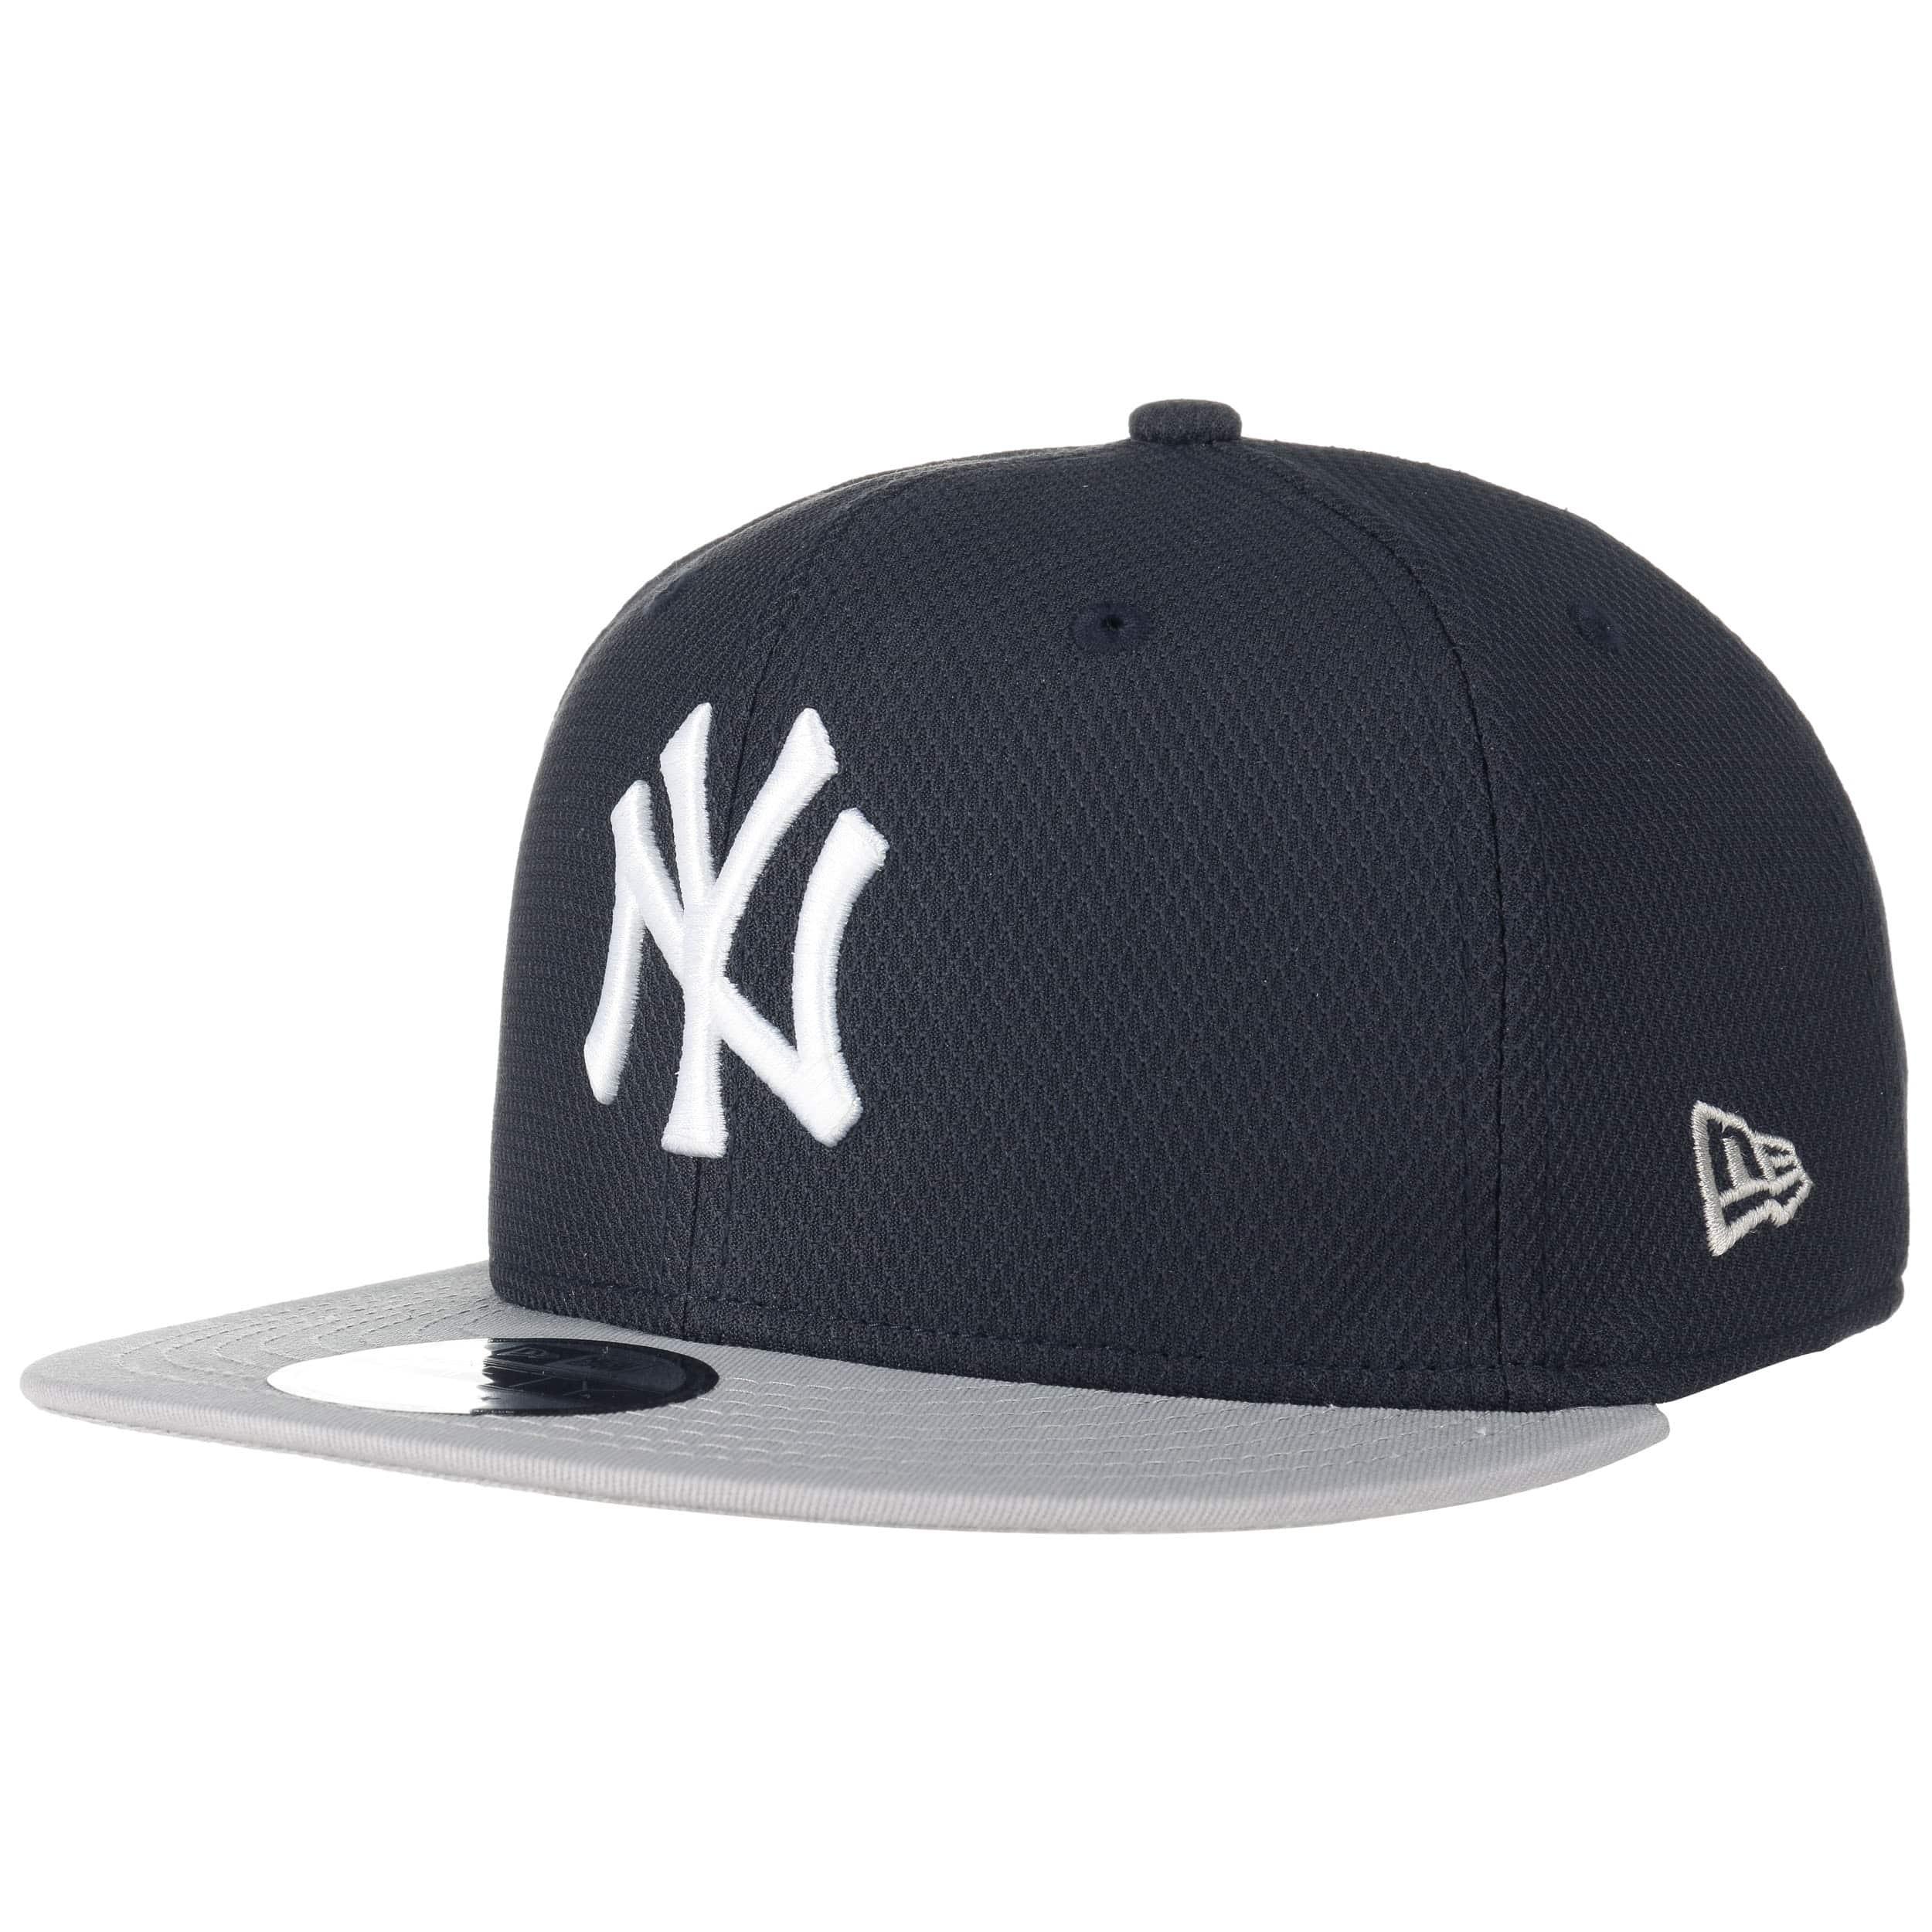 norway 9fifty ny yankees diamond cap by new era navy 6 b49b5 5fbfa 90bc83b9681d